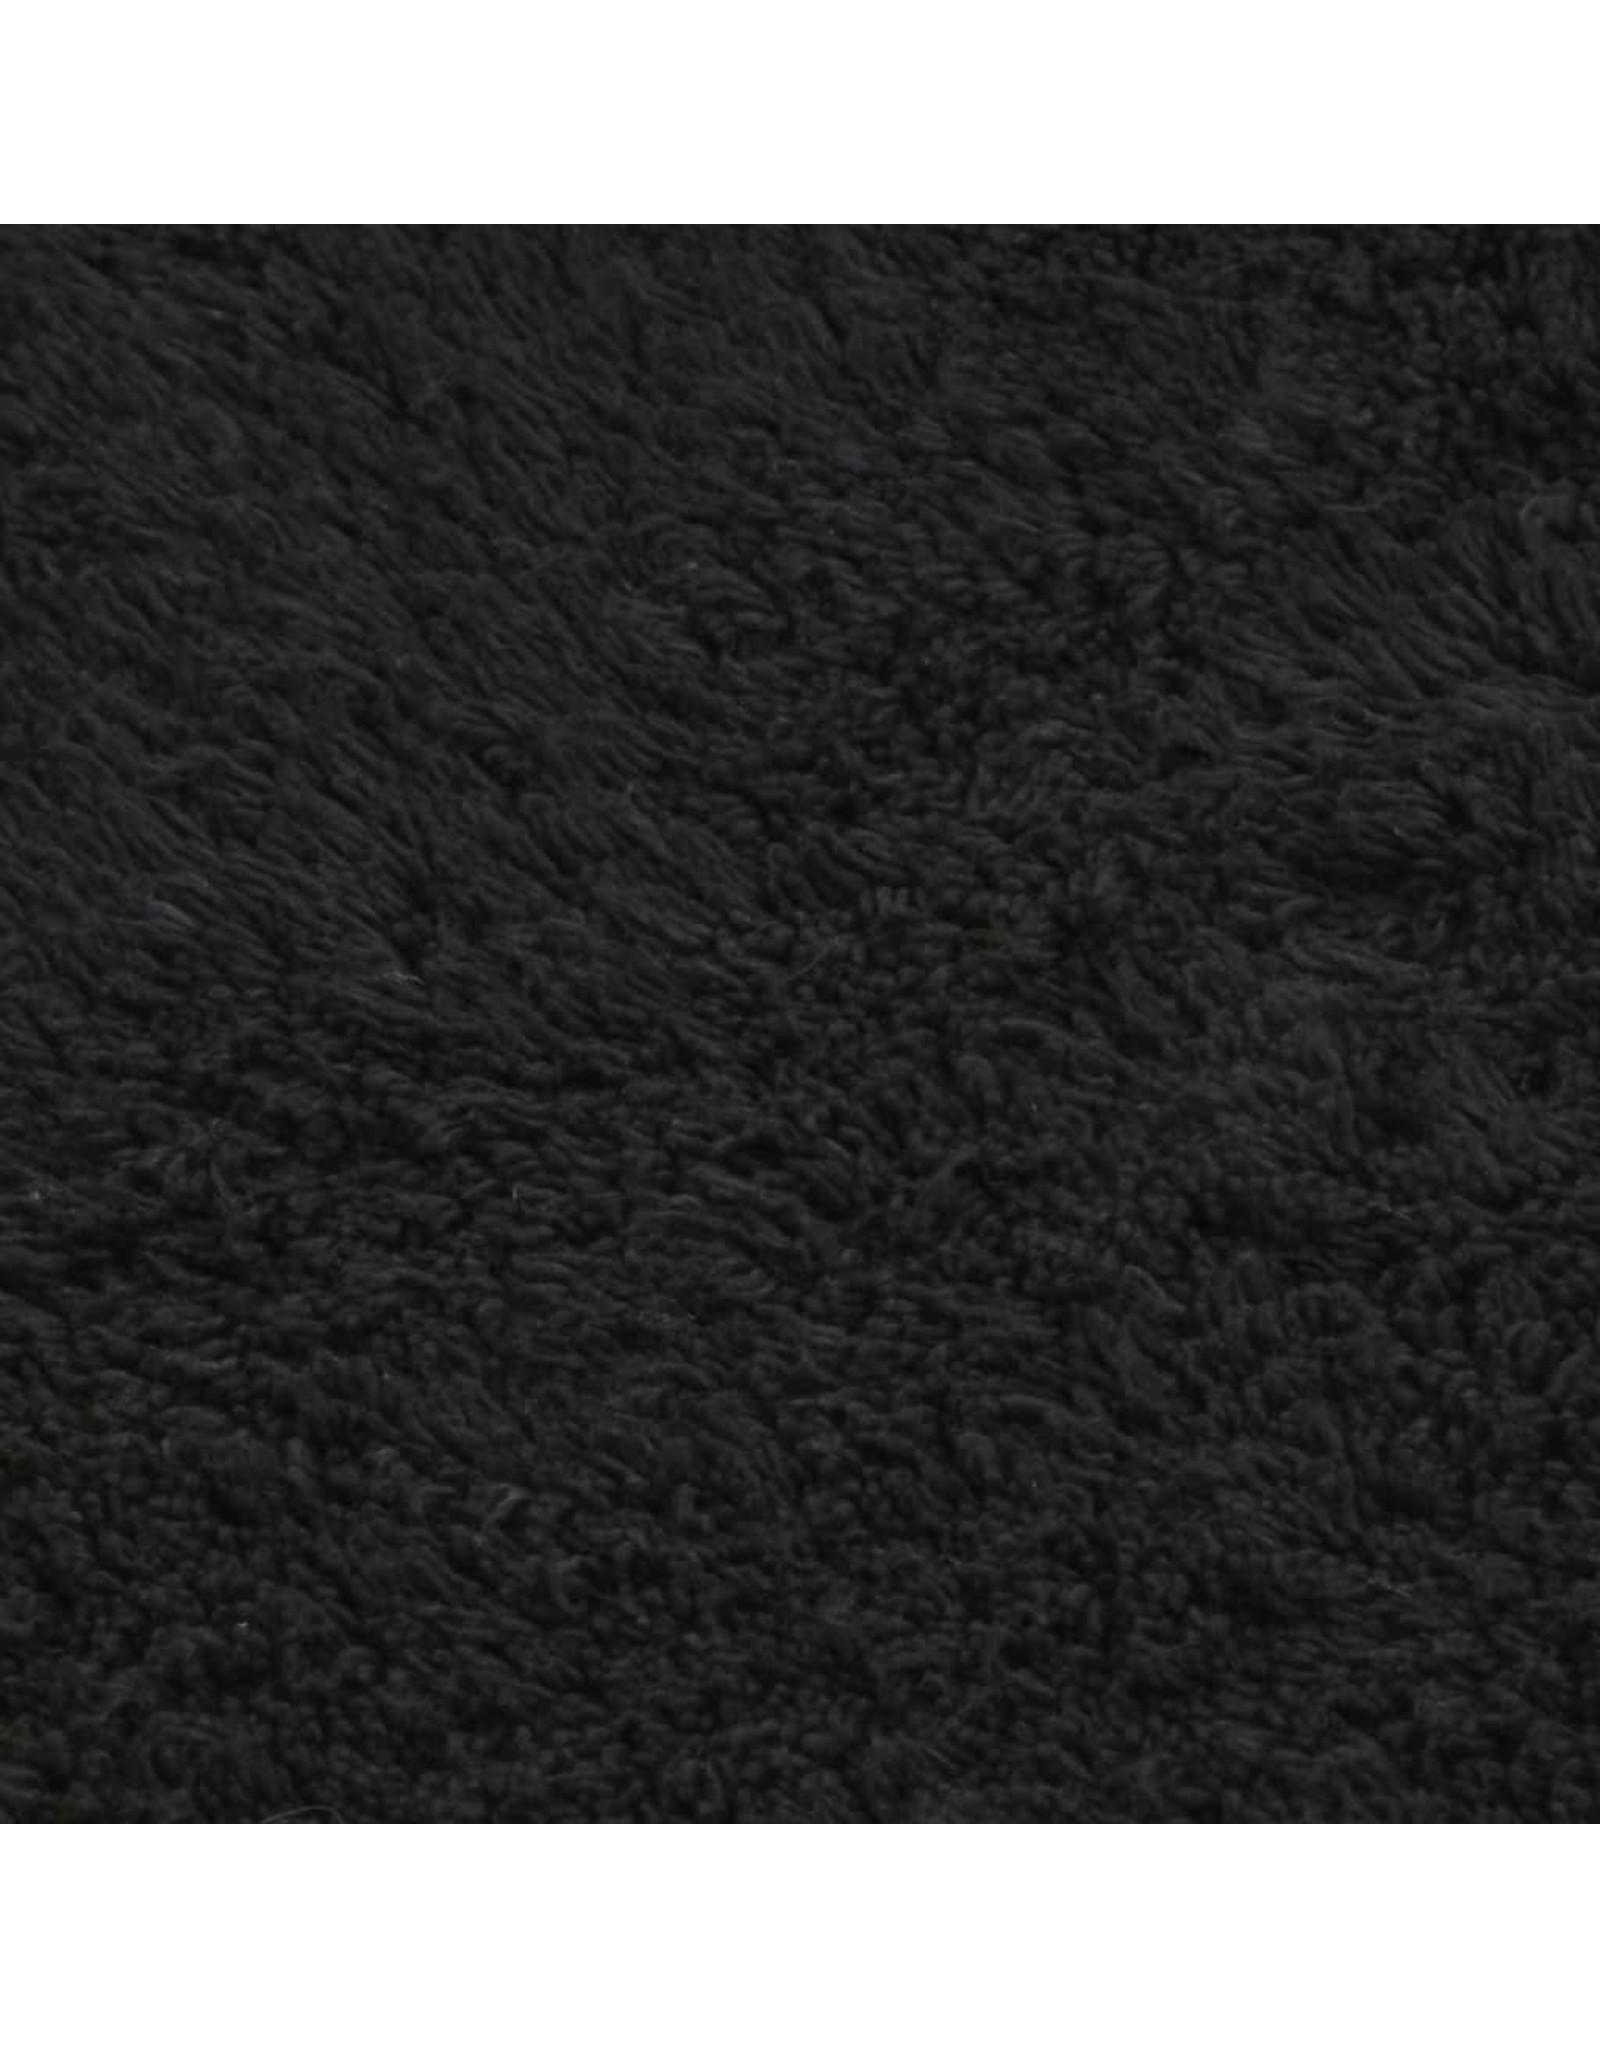 Badmattenset stof antraciet 3 st